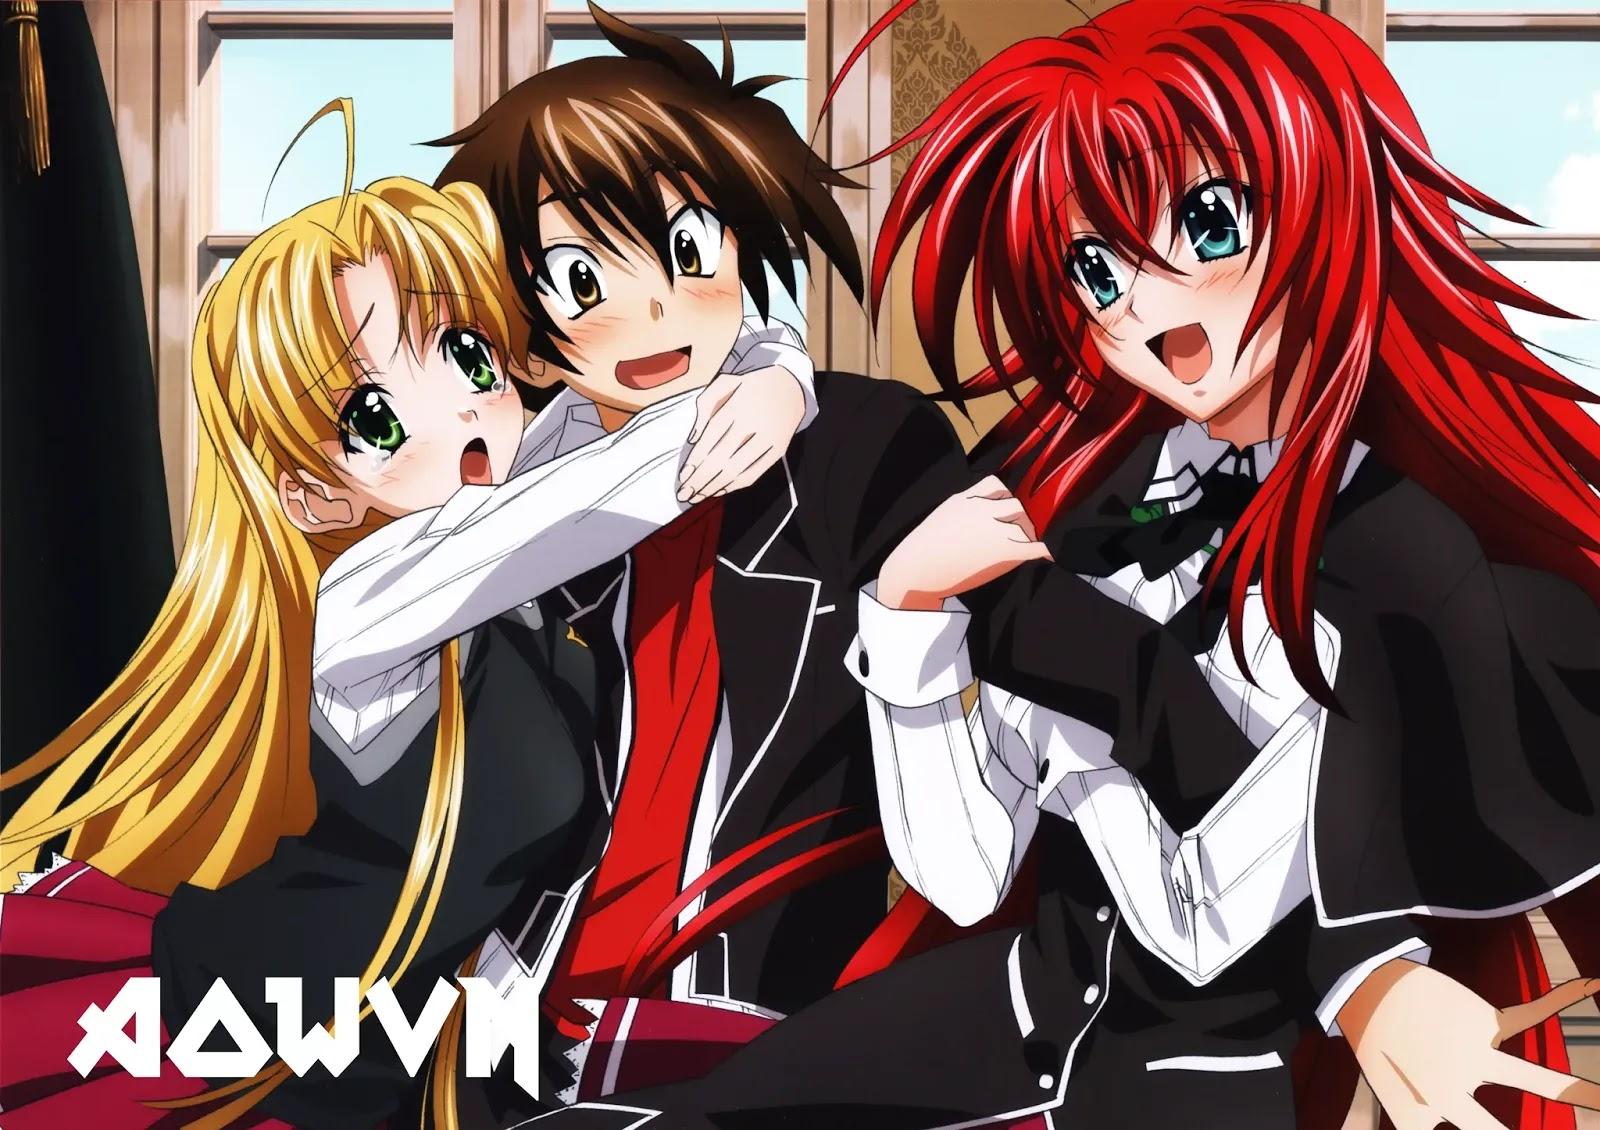 AowVN.org min%2B%25282%2529 - [ Anime 3gp Mp4 ] Highschool DxD SS1 + SS2 + SS3 + OVA + Special BD | Vietsub - Harem Ecchi Hay